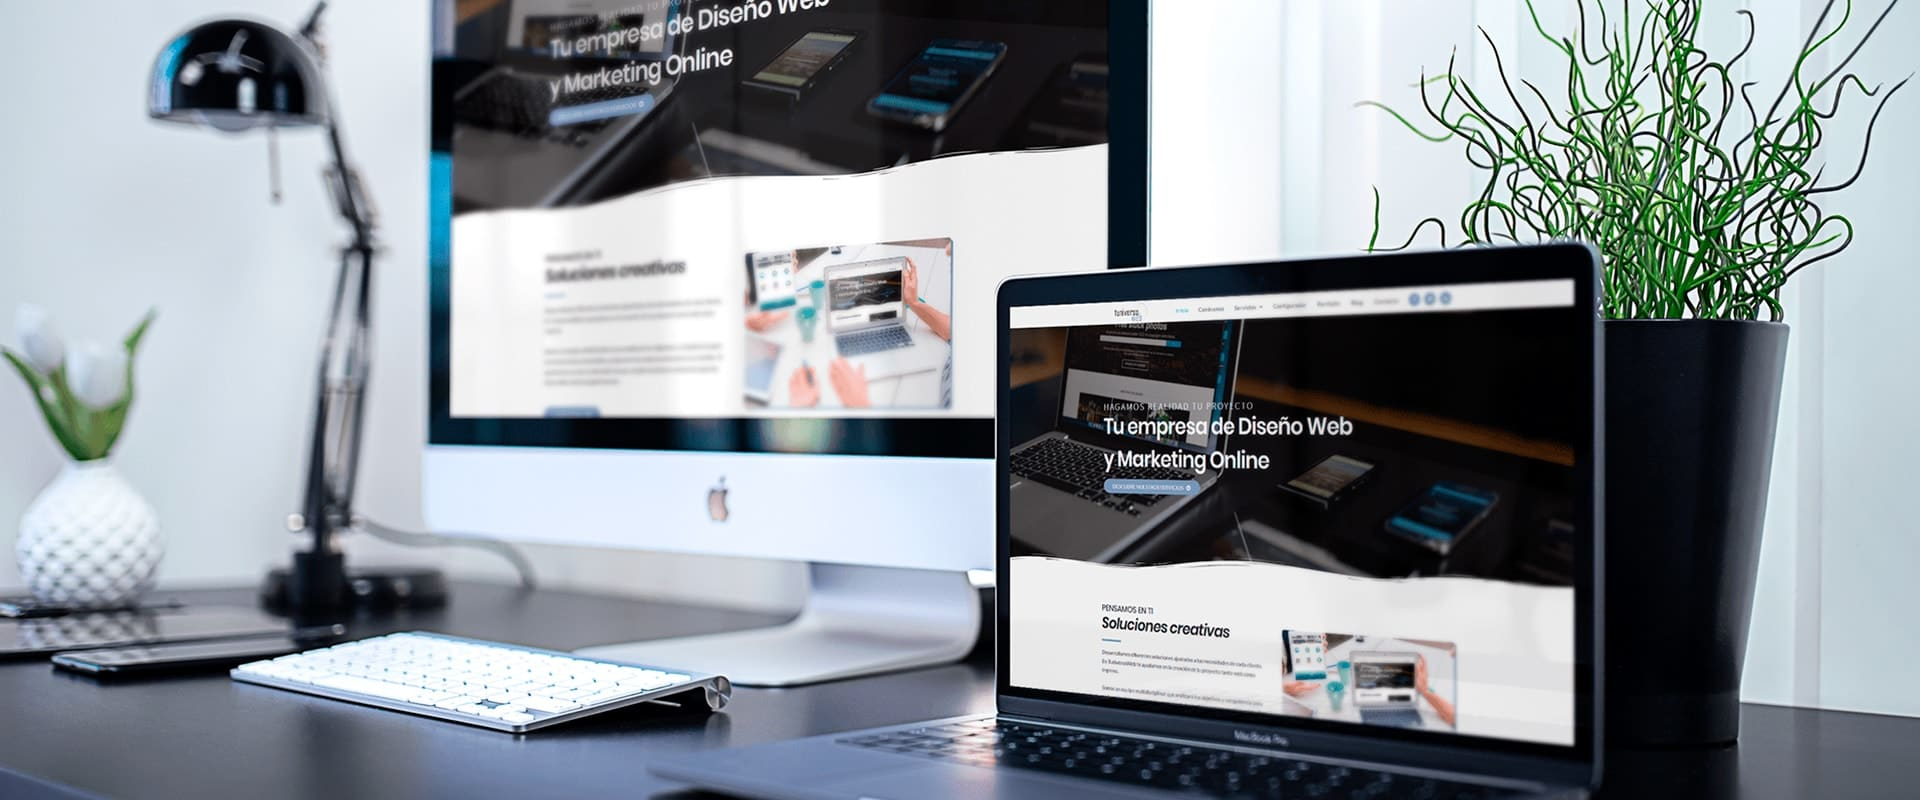 entrada-tuniversoweb-empresa-profesional-diseno-web-01